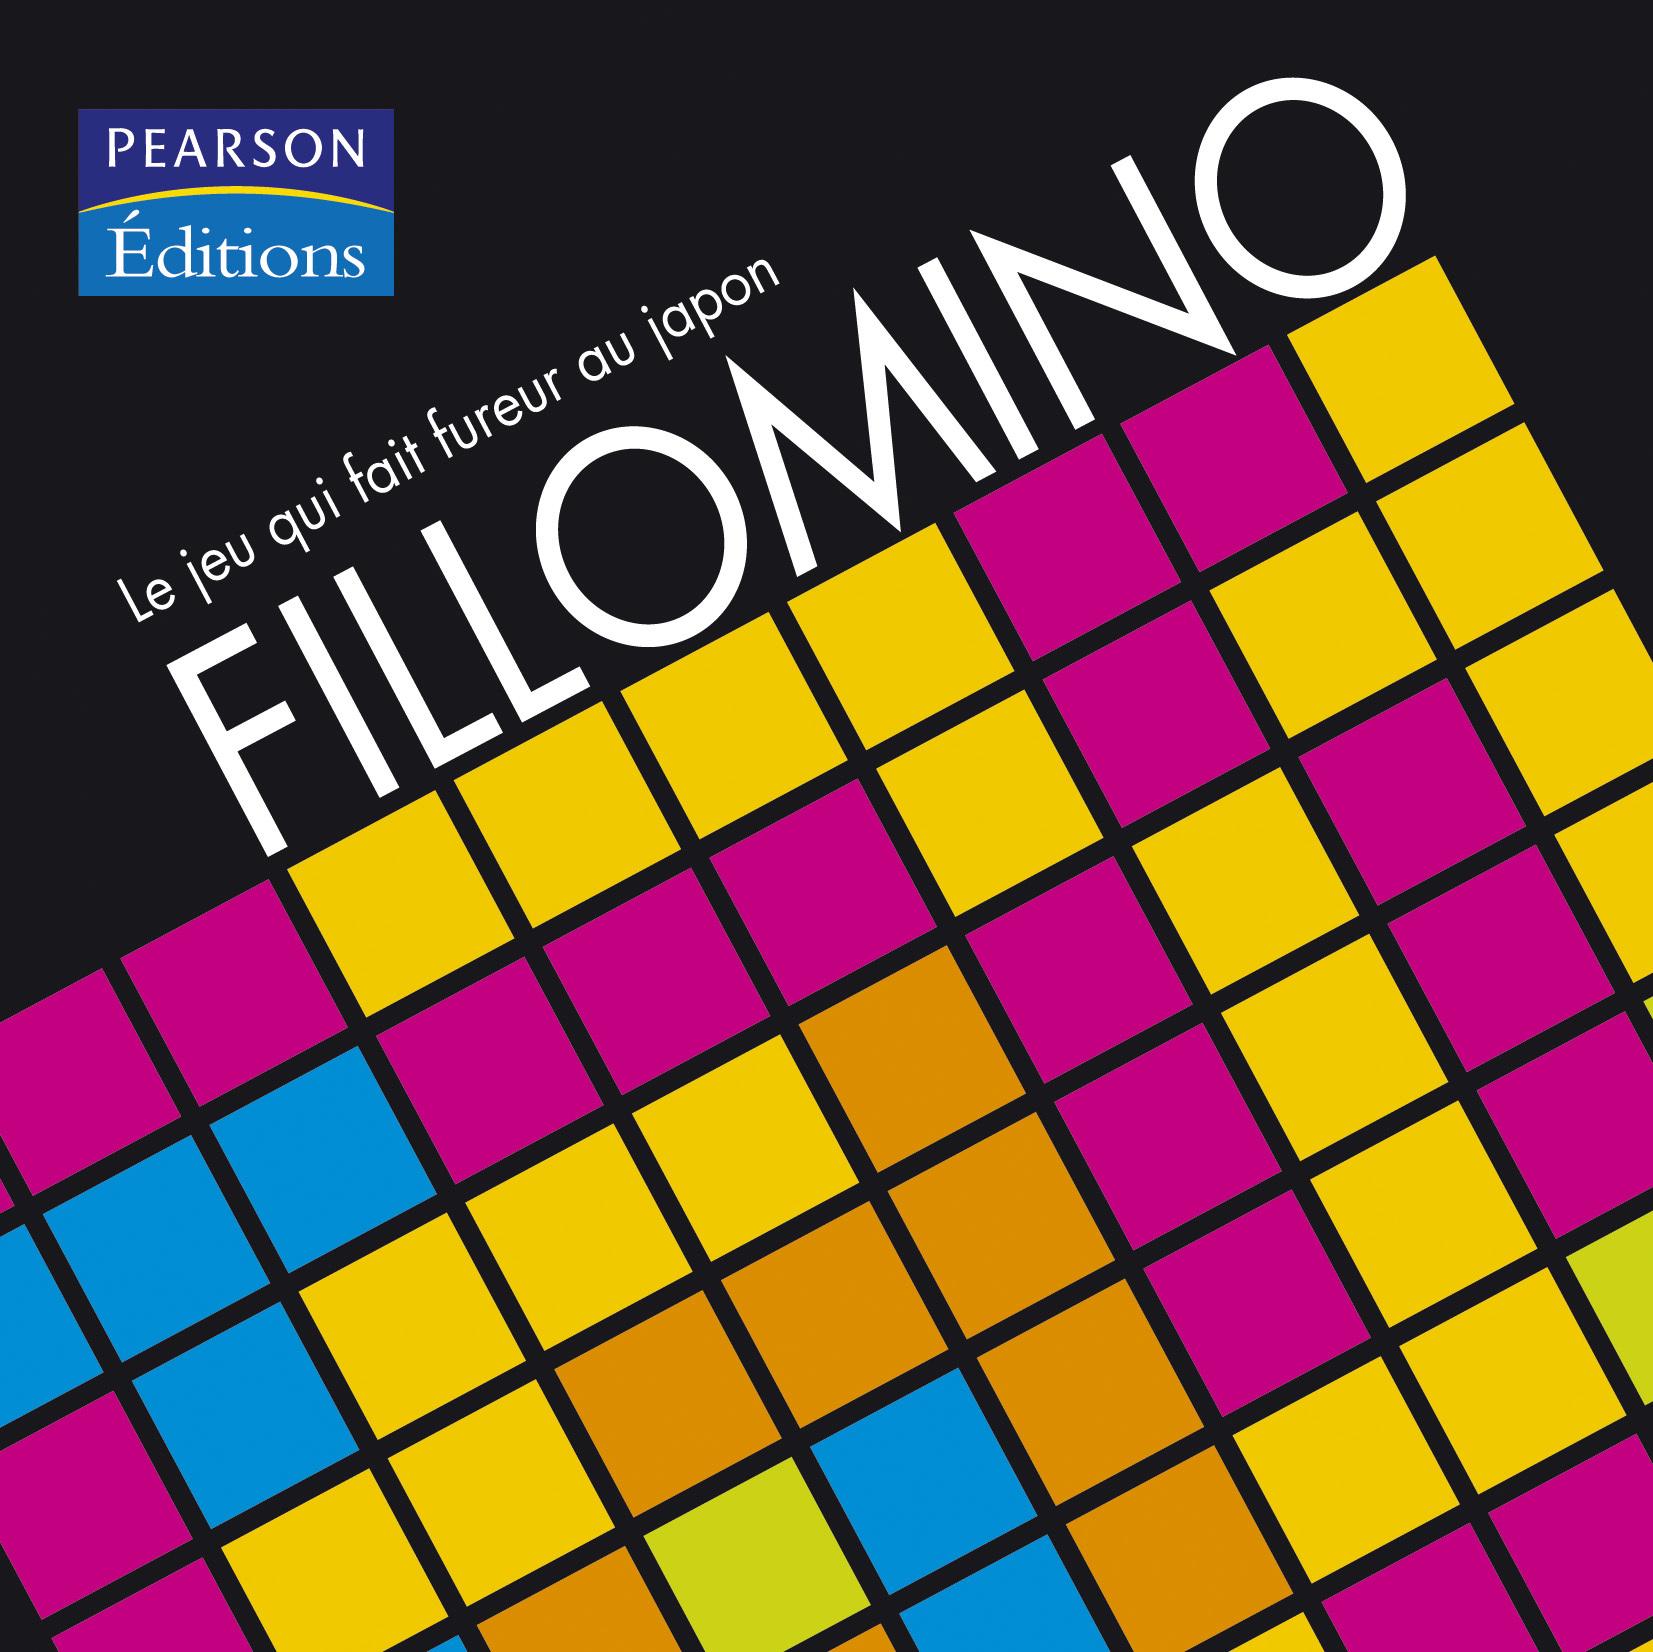 FILLOMINO